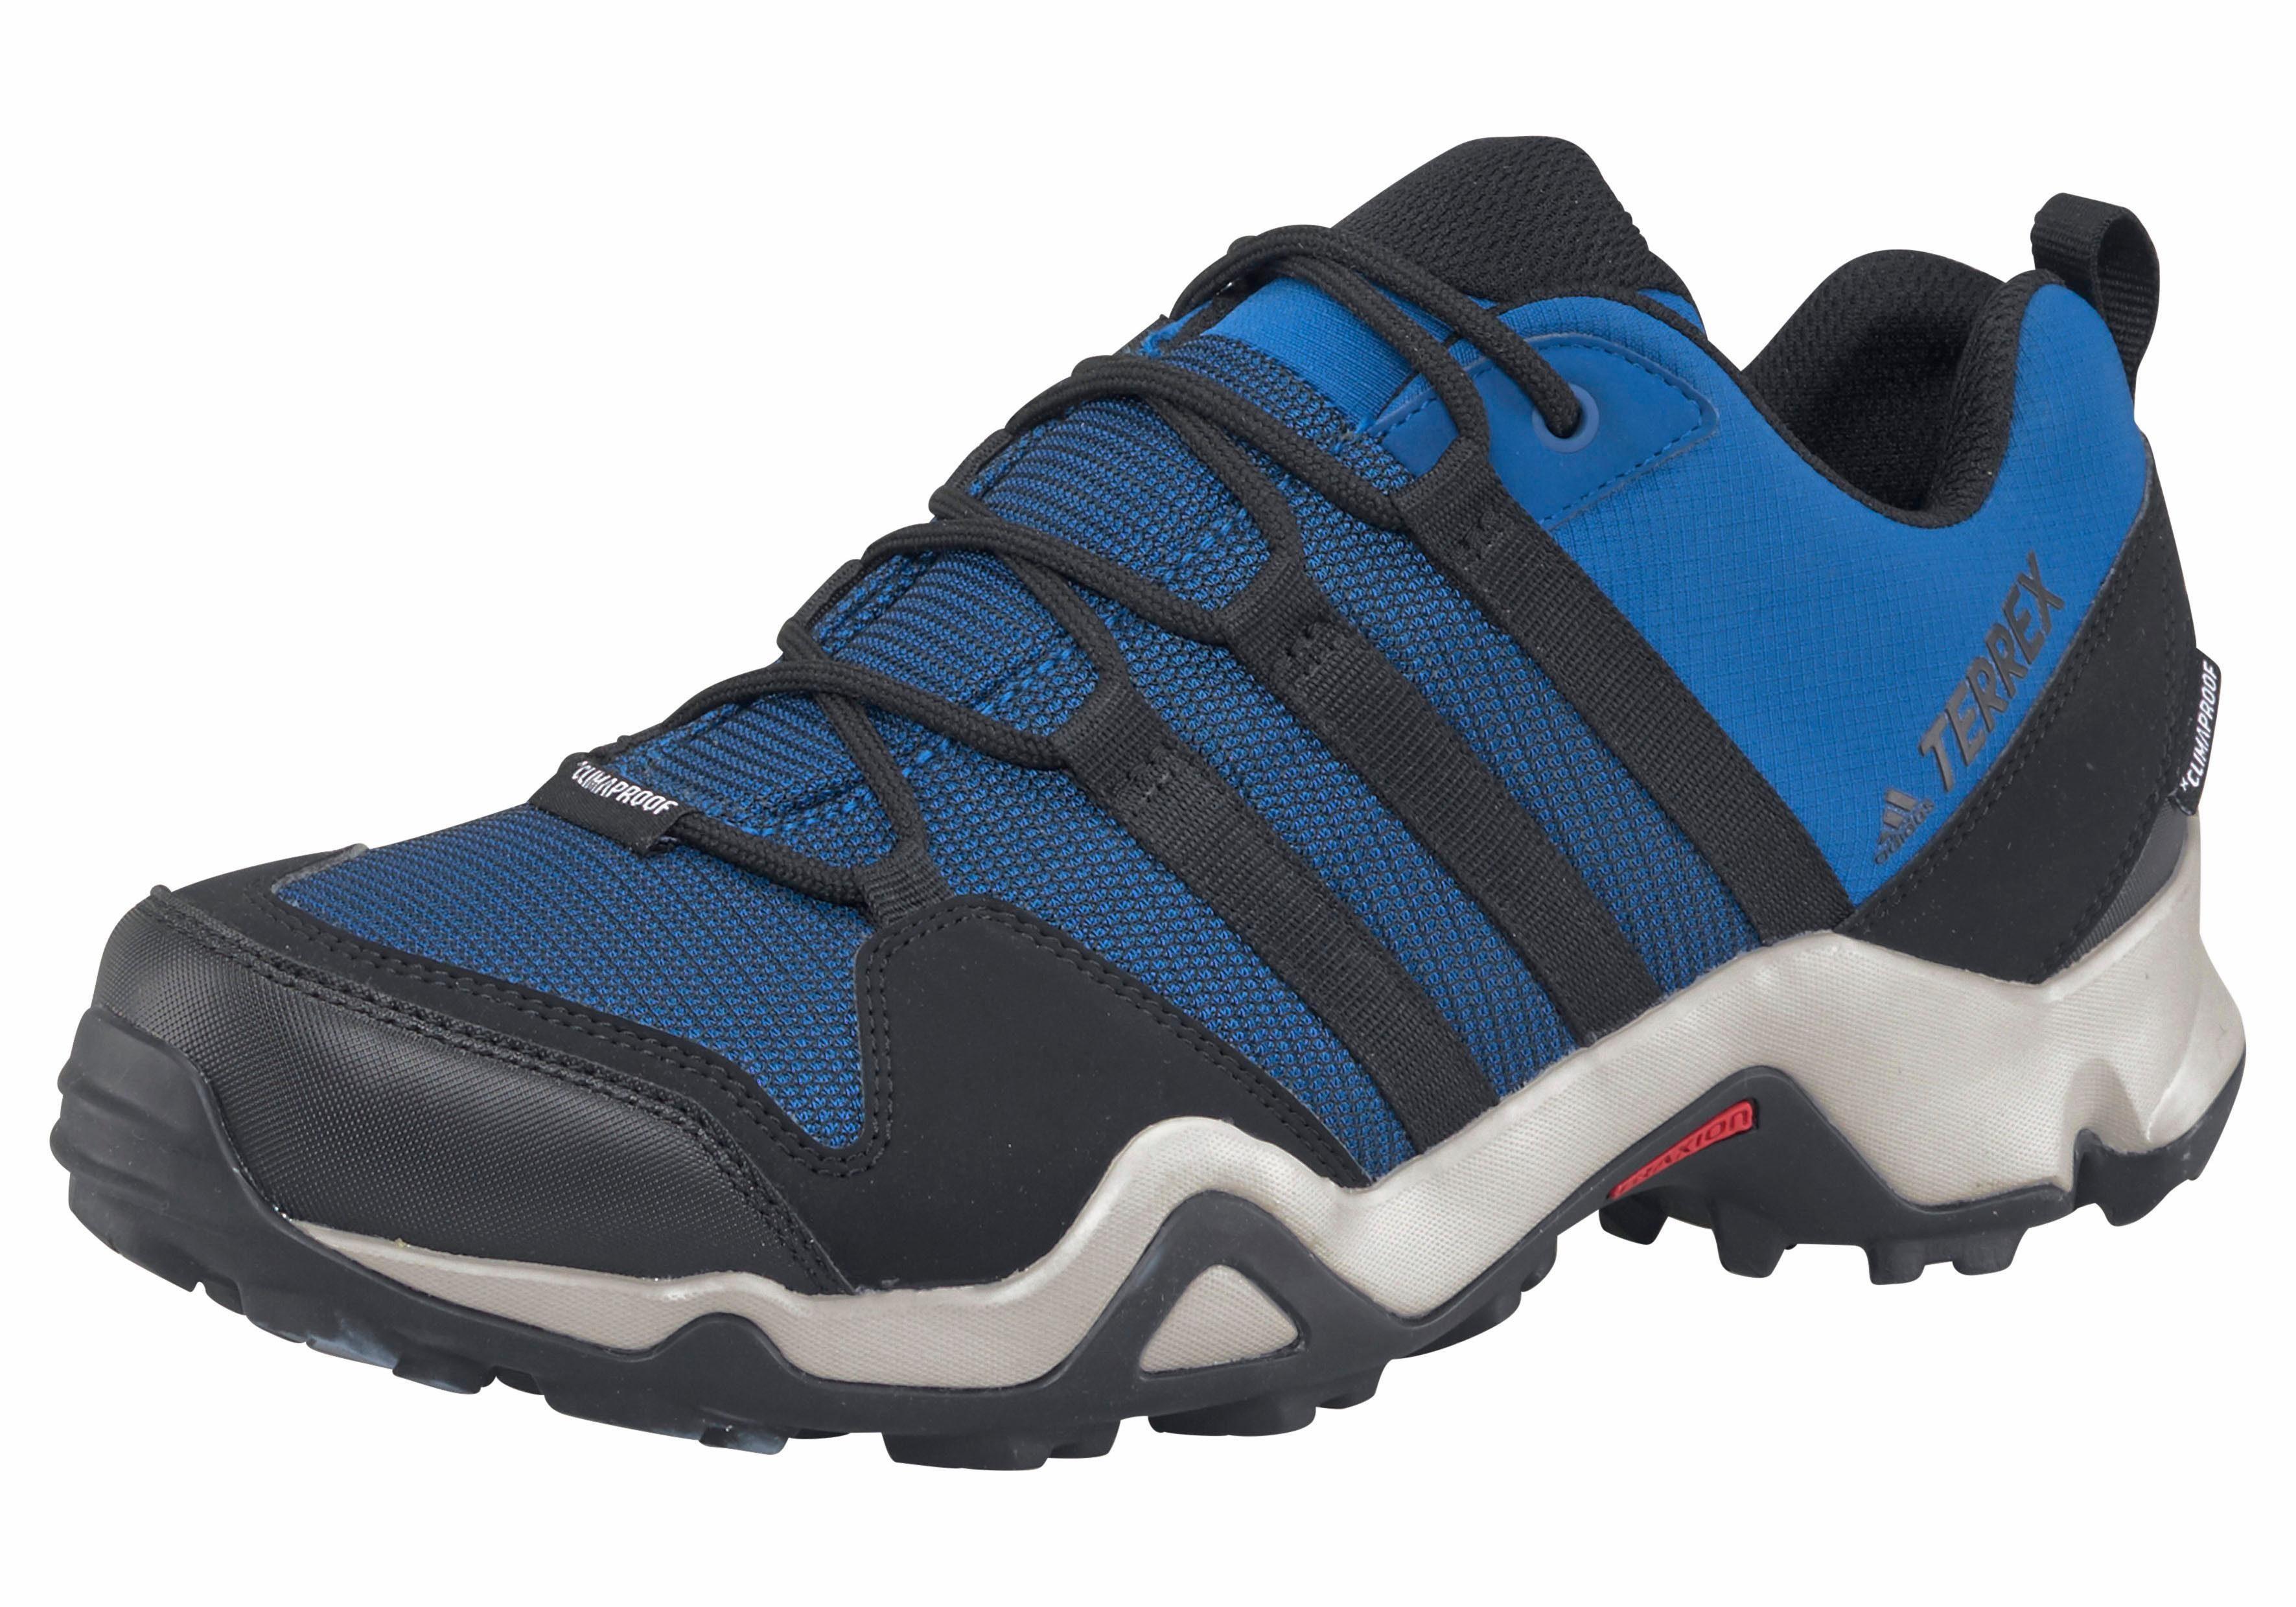 adidas Performance Terrex AX2 CP Outdoorschuh, Climaproof online kaufen  blau